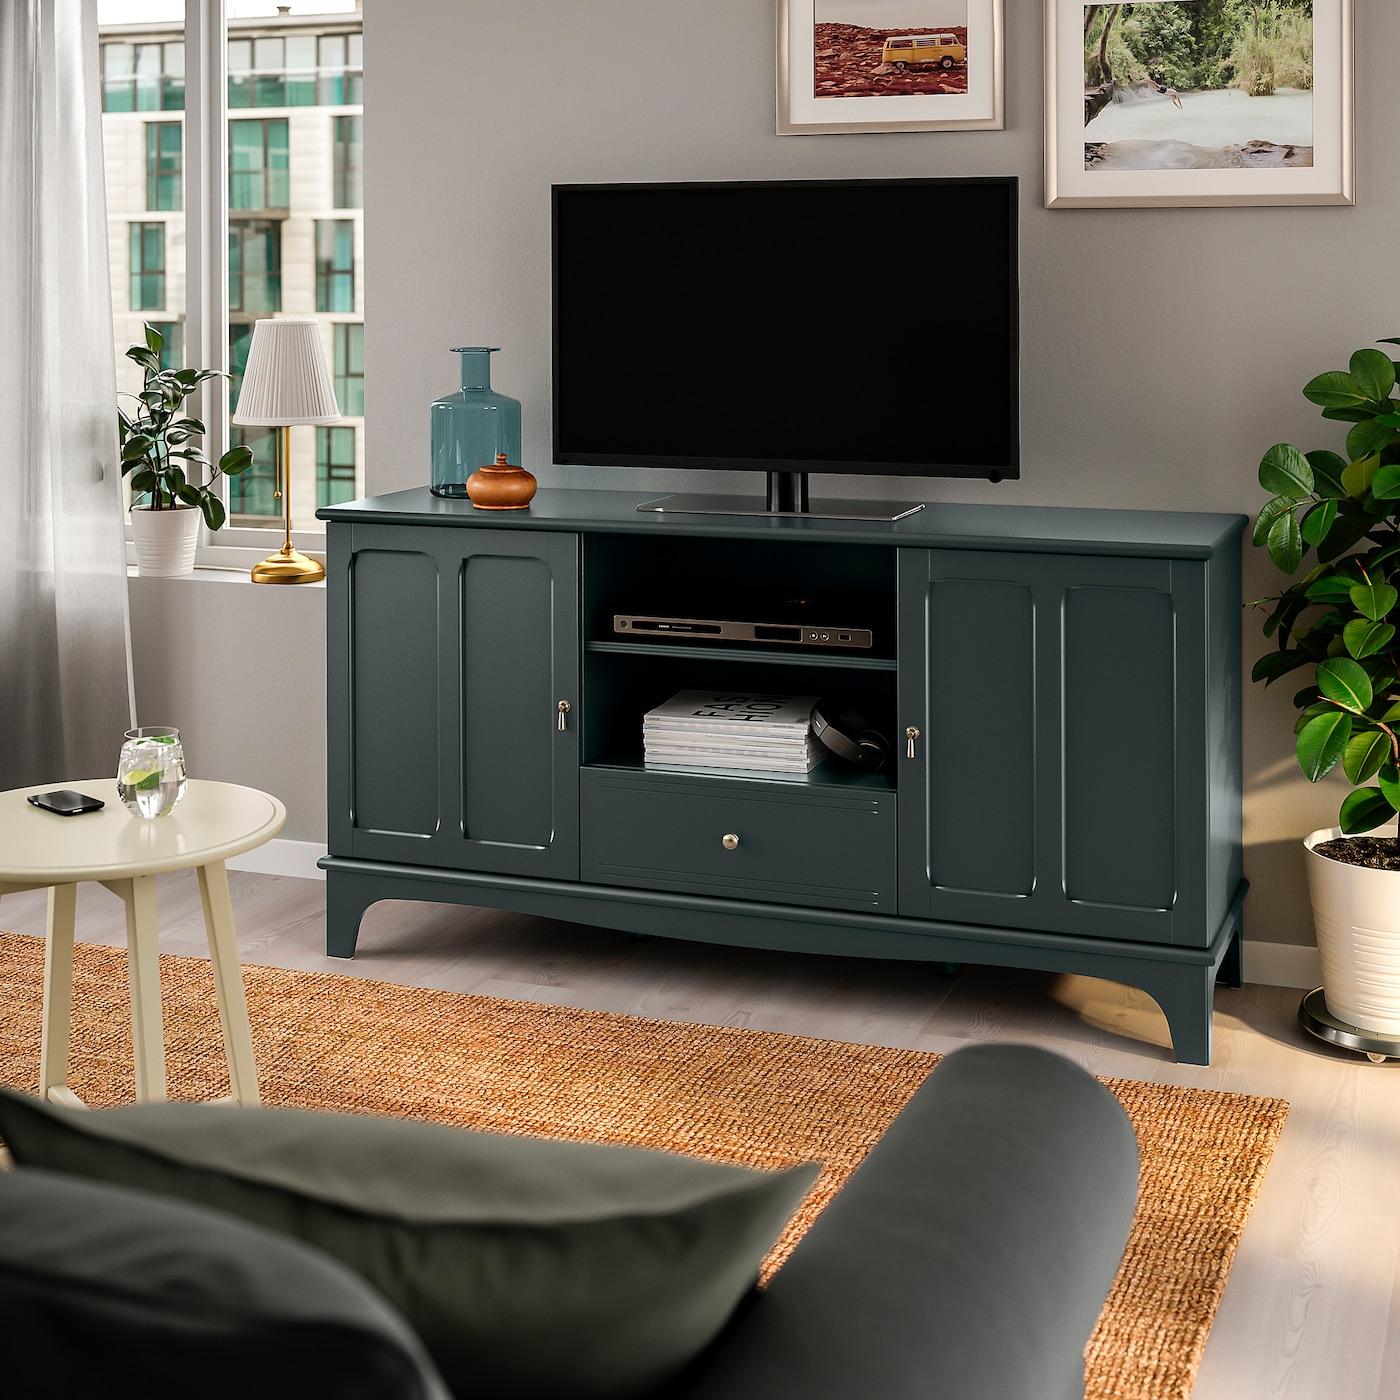 Lommarp Tv Bench Dark Blue Green 159x45x81 Cm Ikea